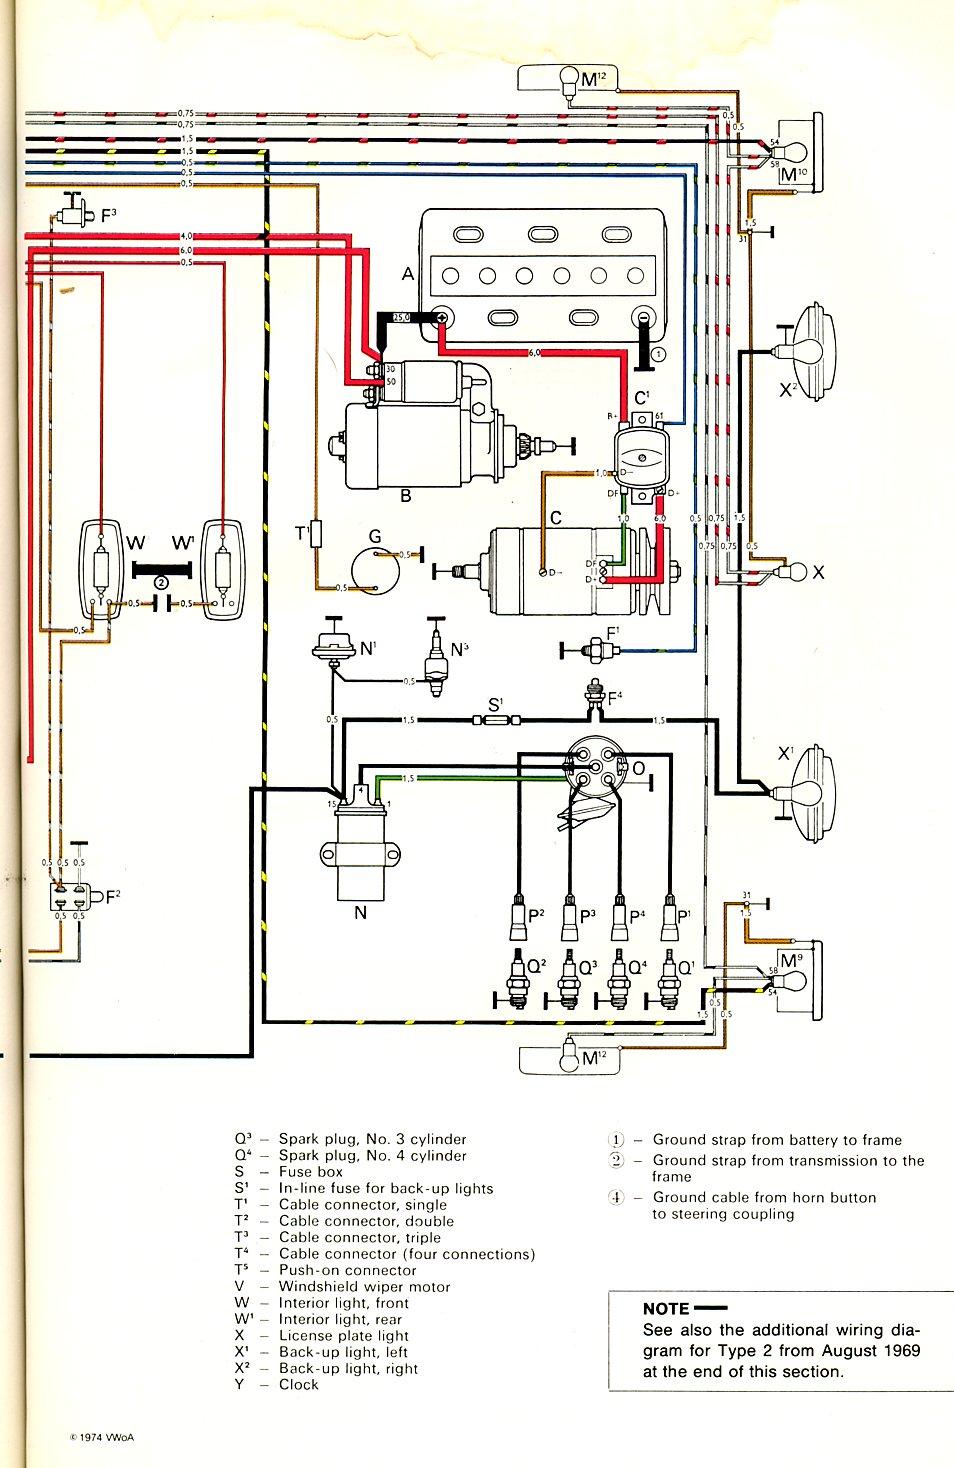 vs_5066] 1974 vw thing wiring diagram http wwwthesambacom vw archives info wiring  diagram  olyti embo ungo momece mohammedshrine librar wiring 101